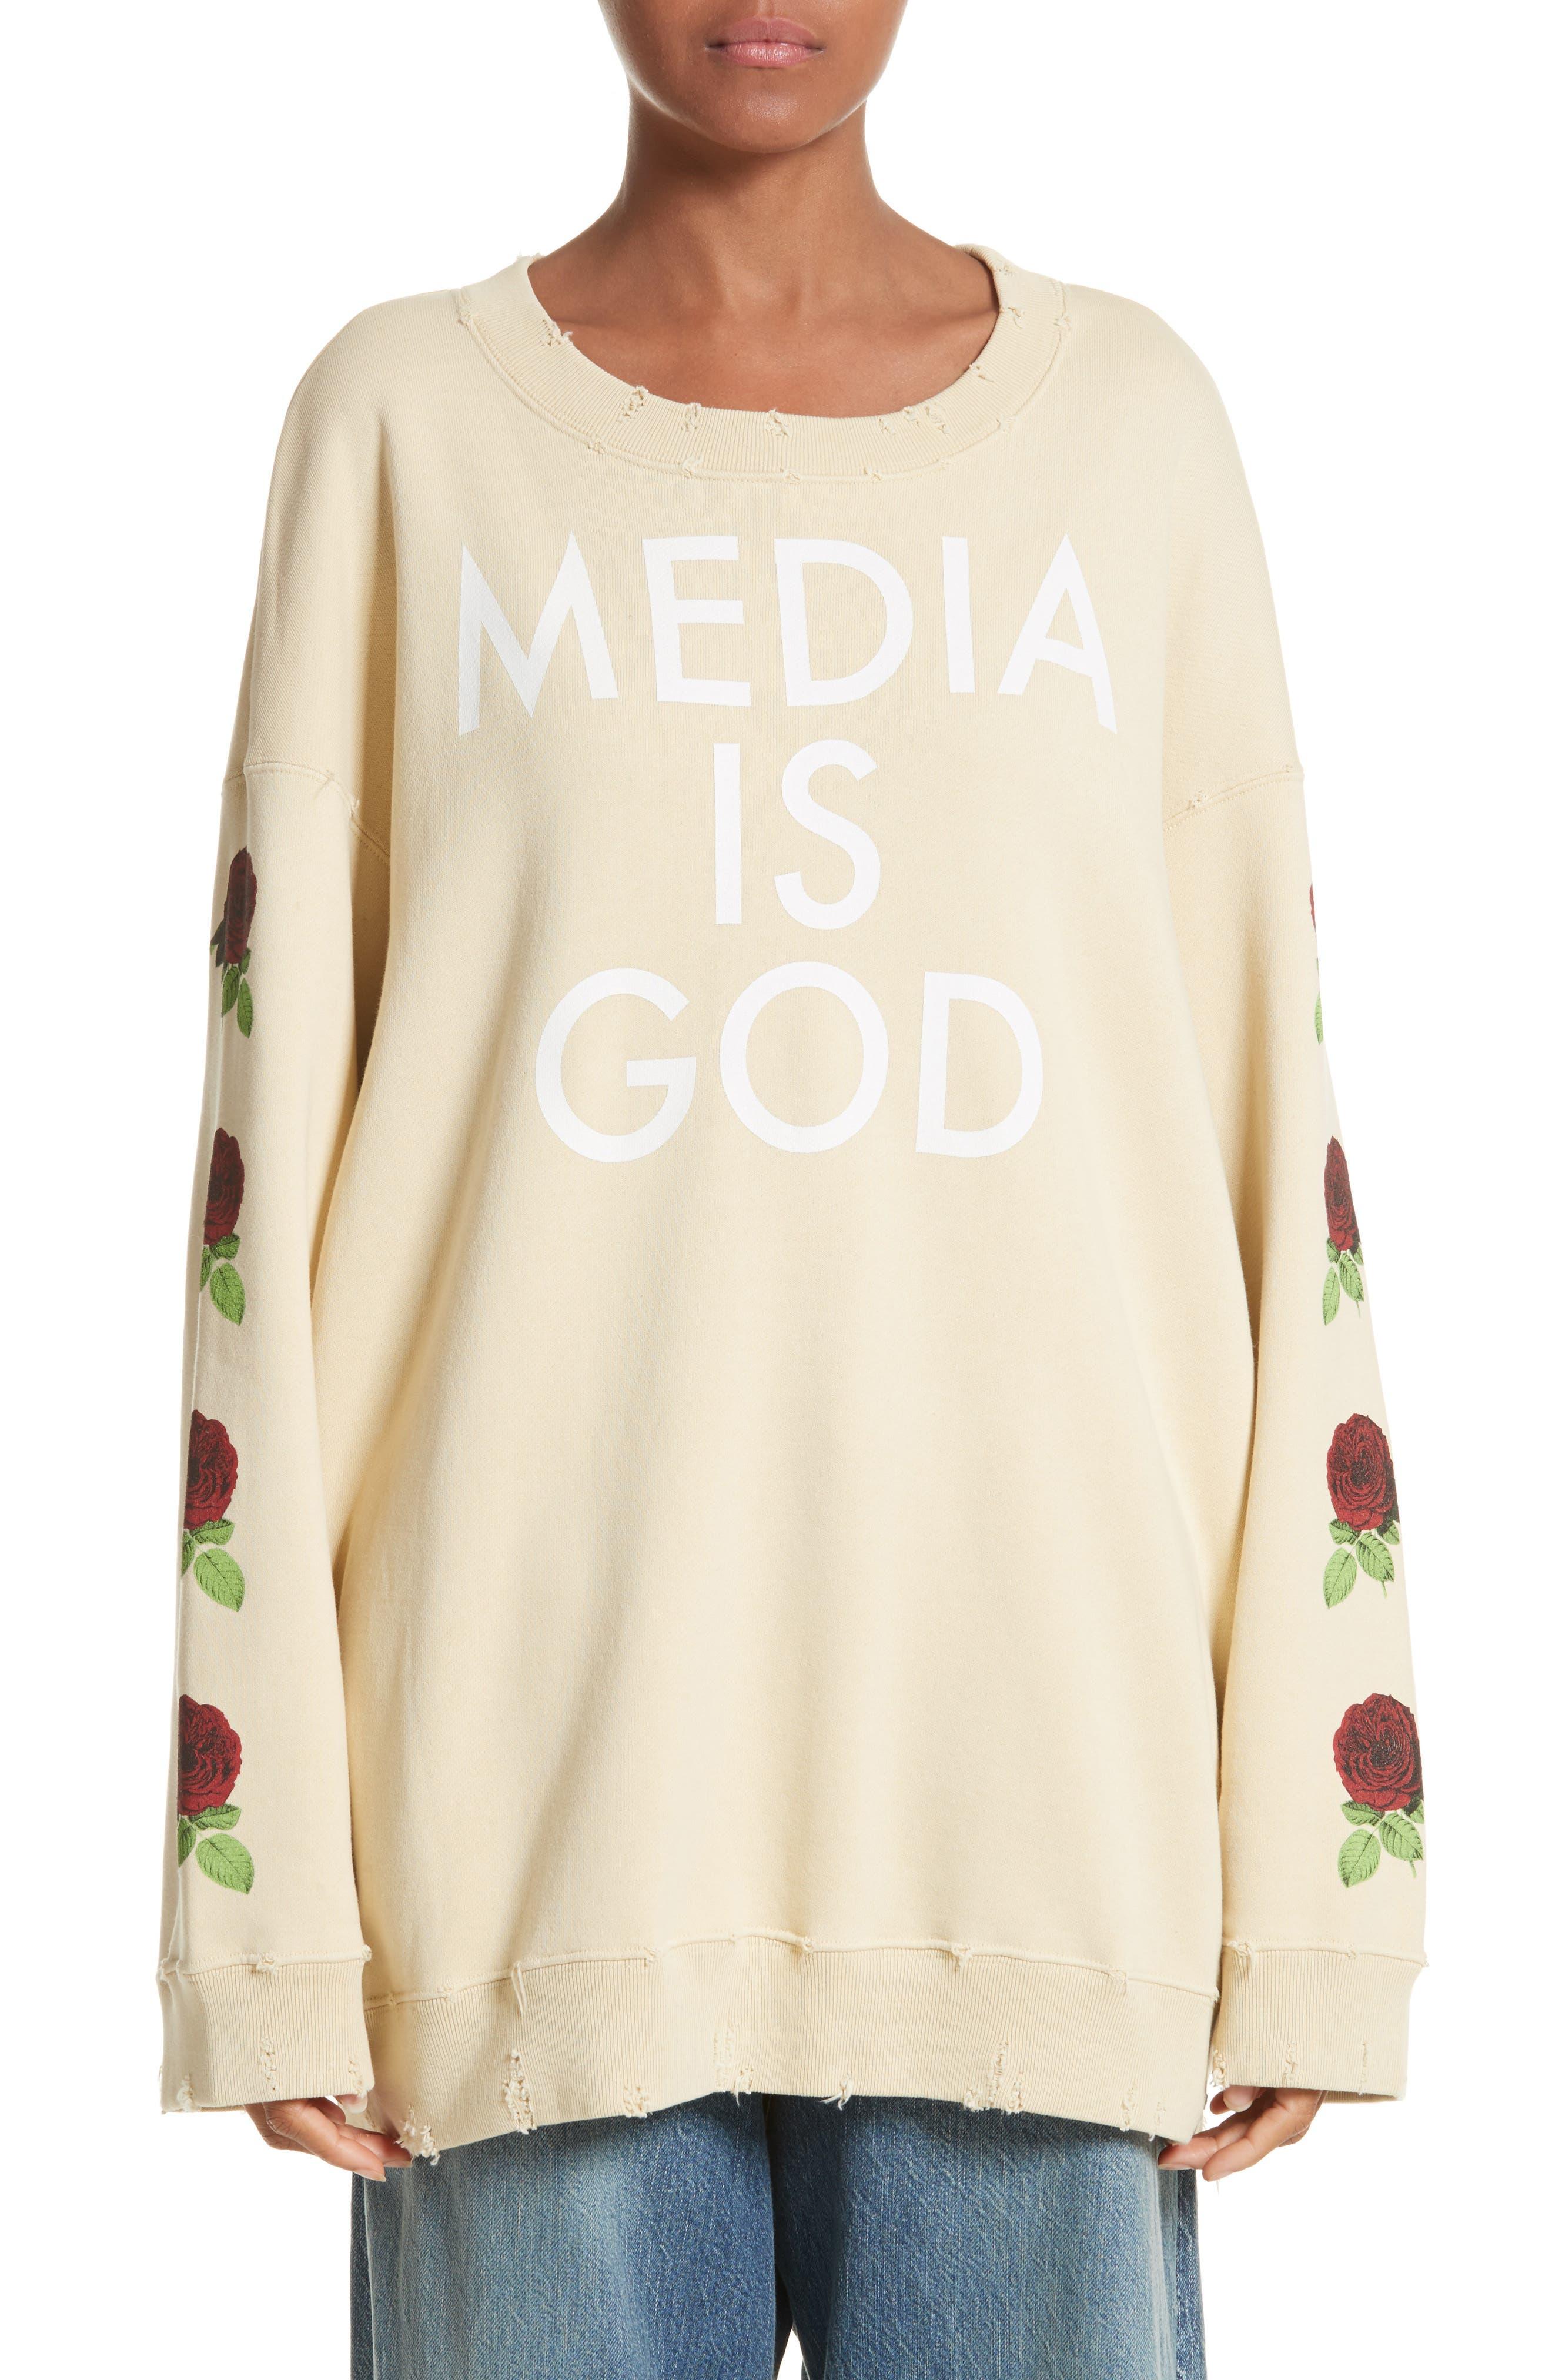 Main Image - Undercover Media Is God Sweatshirt